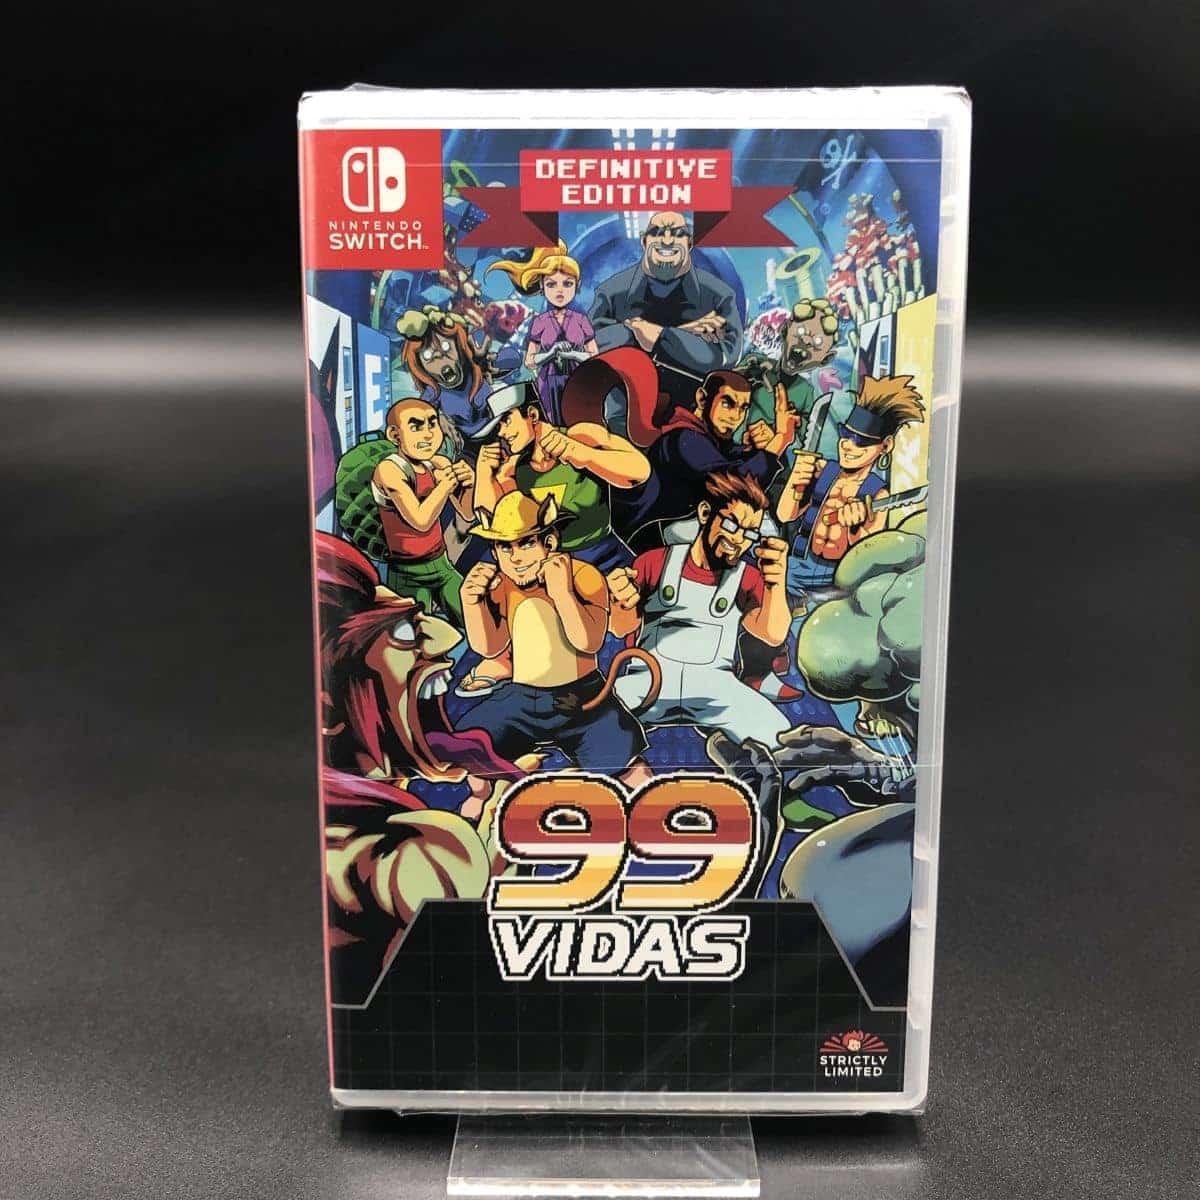 99Vidas (Definitive Edition) (NEU) Nintendo Switch